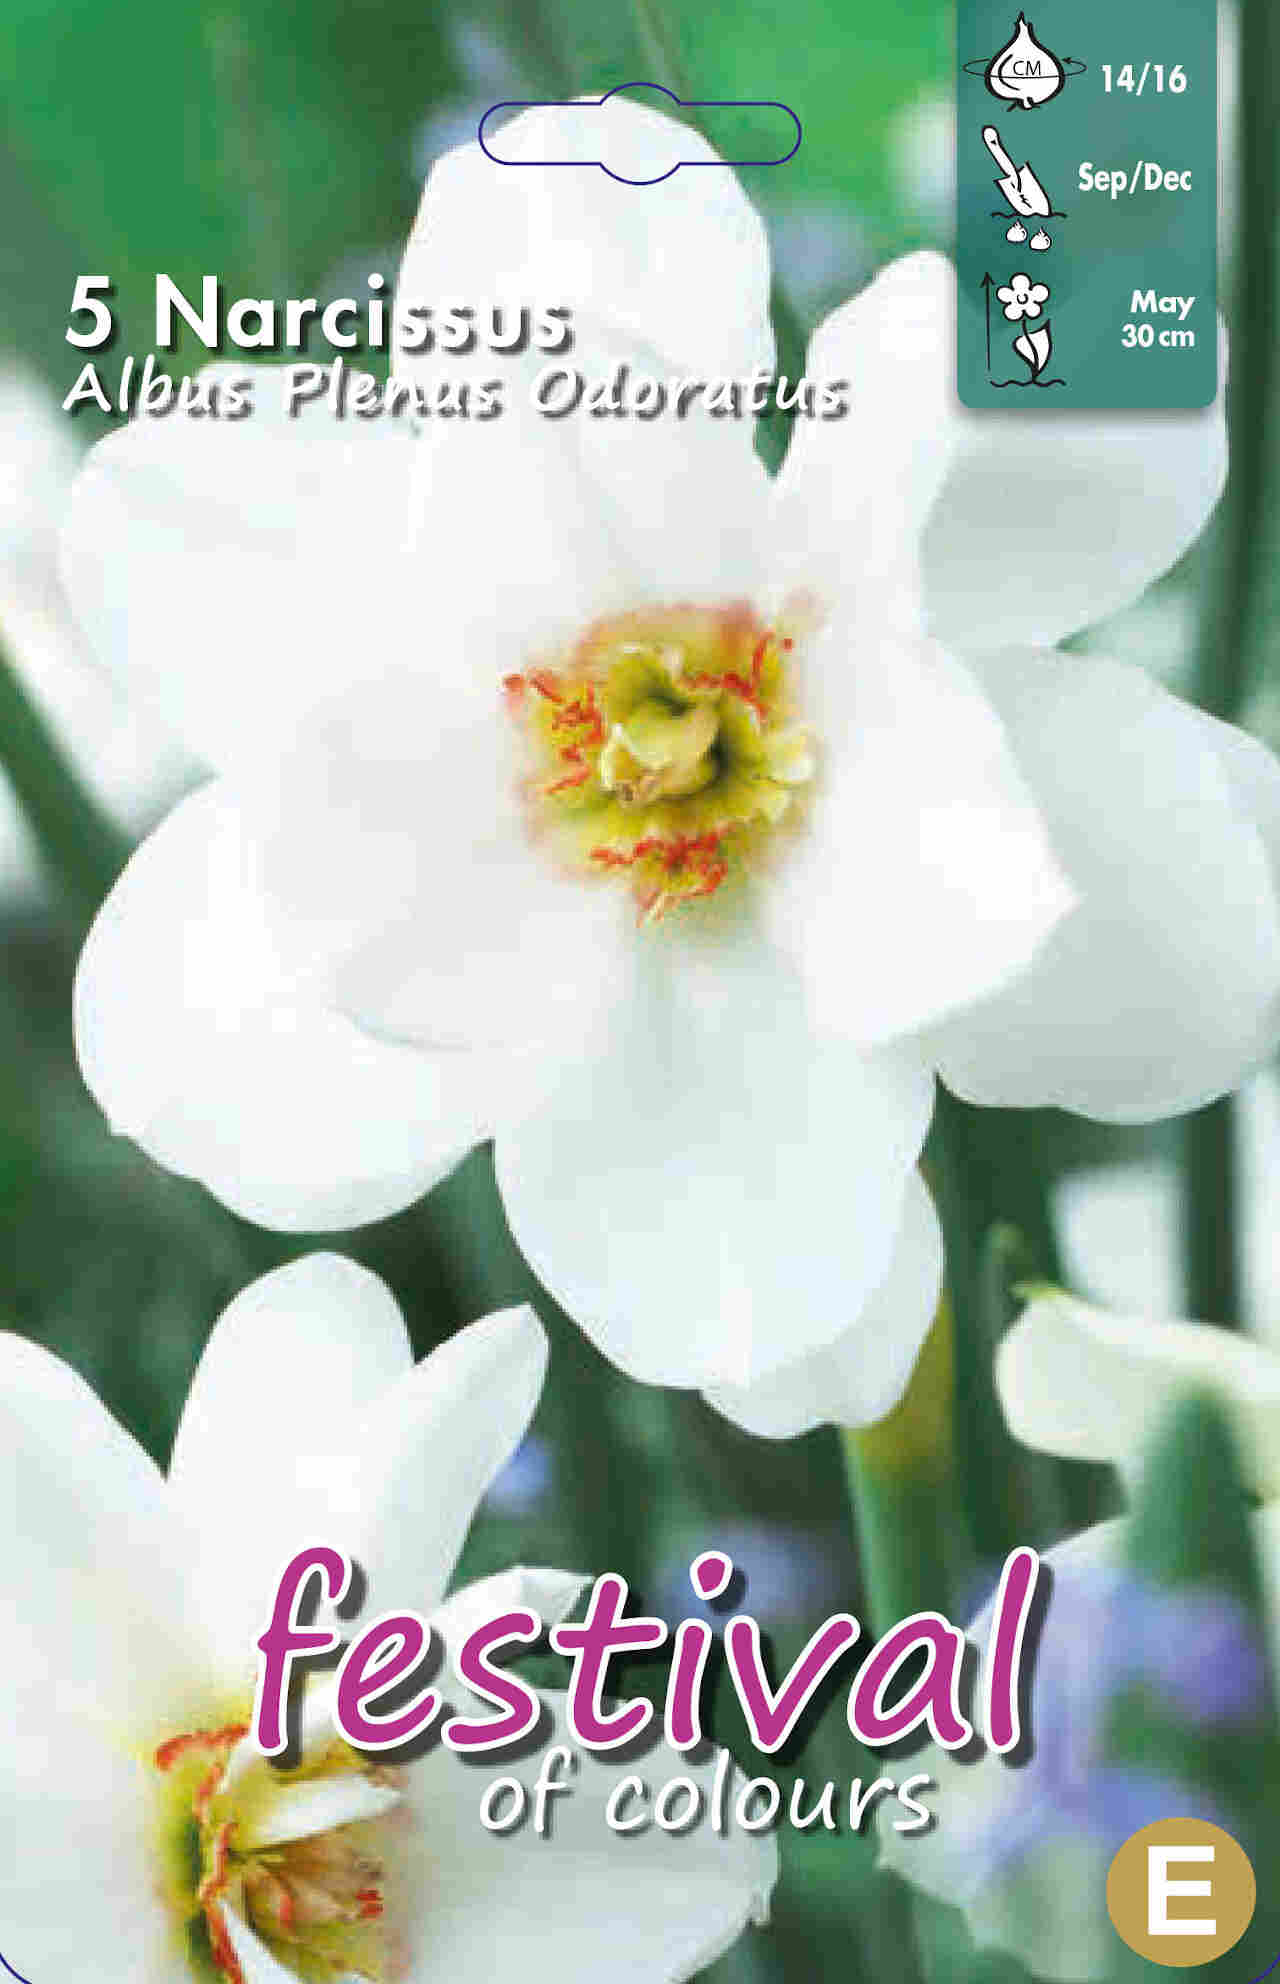 Påskeliljeløg - Narcissus Albus Plenus Odoratus 14/16